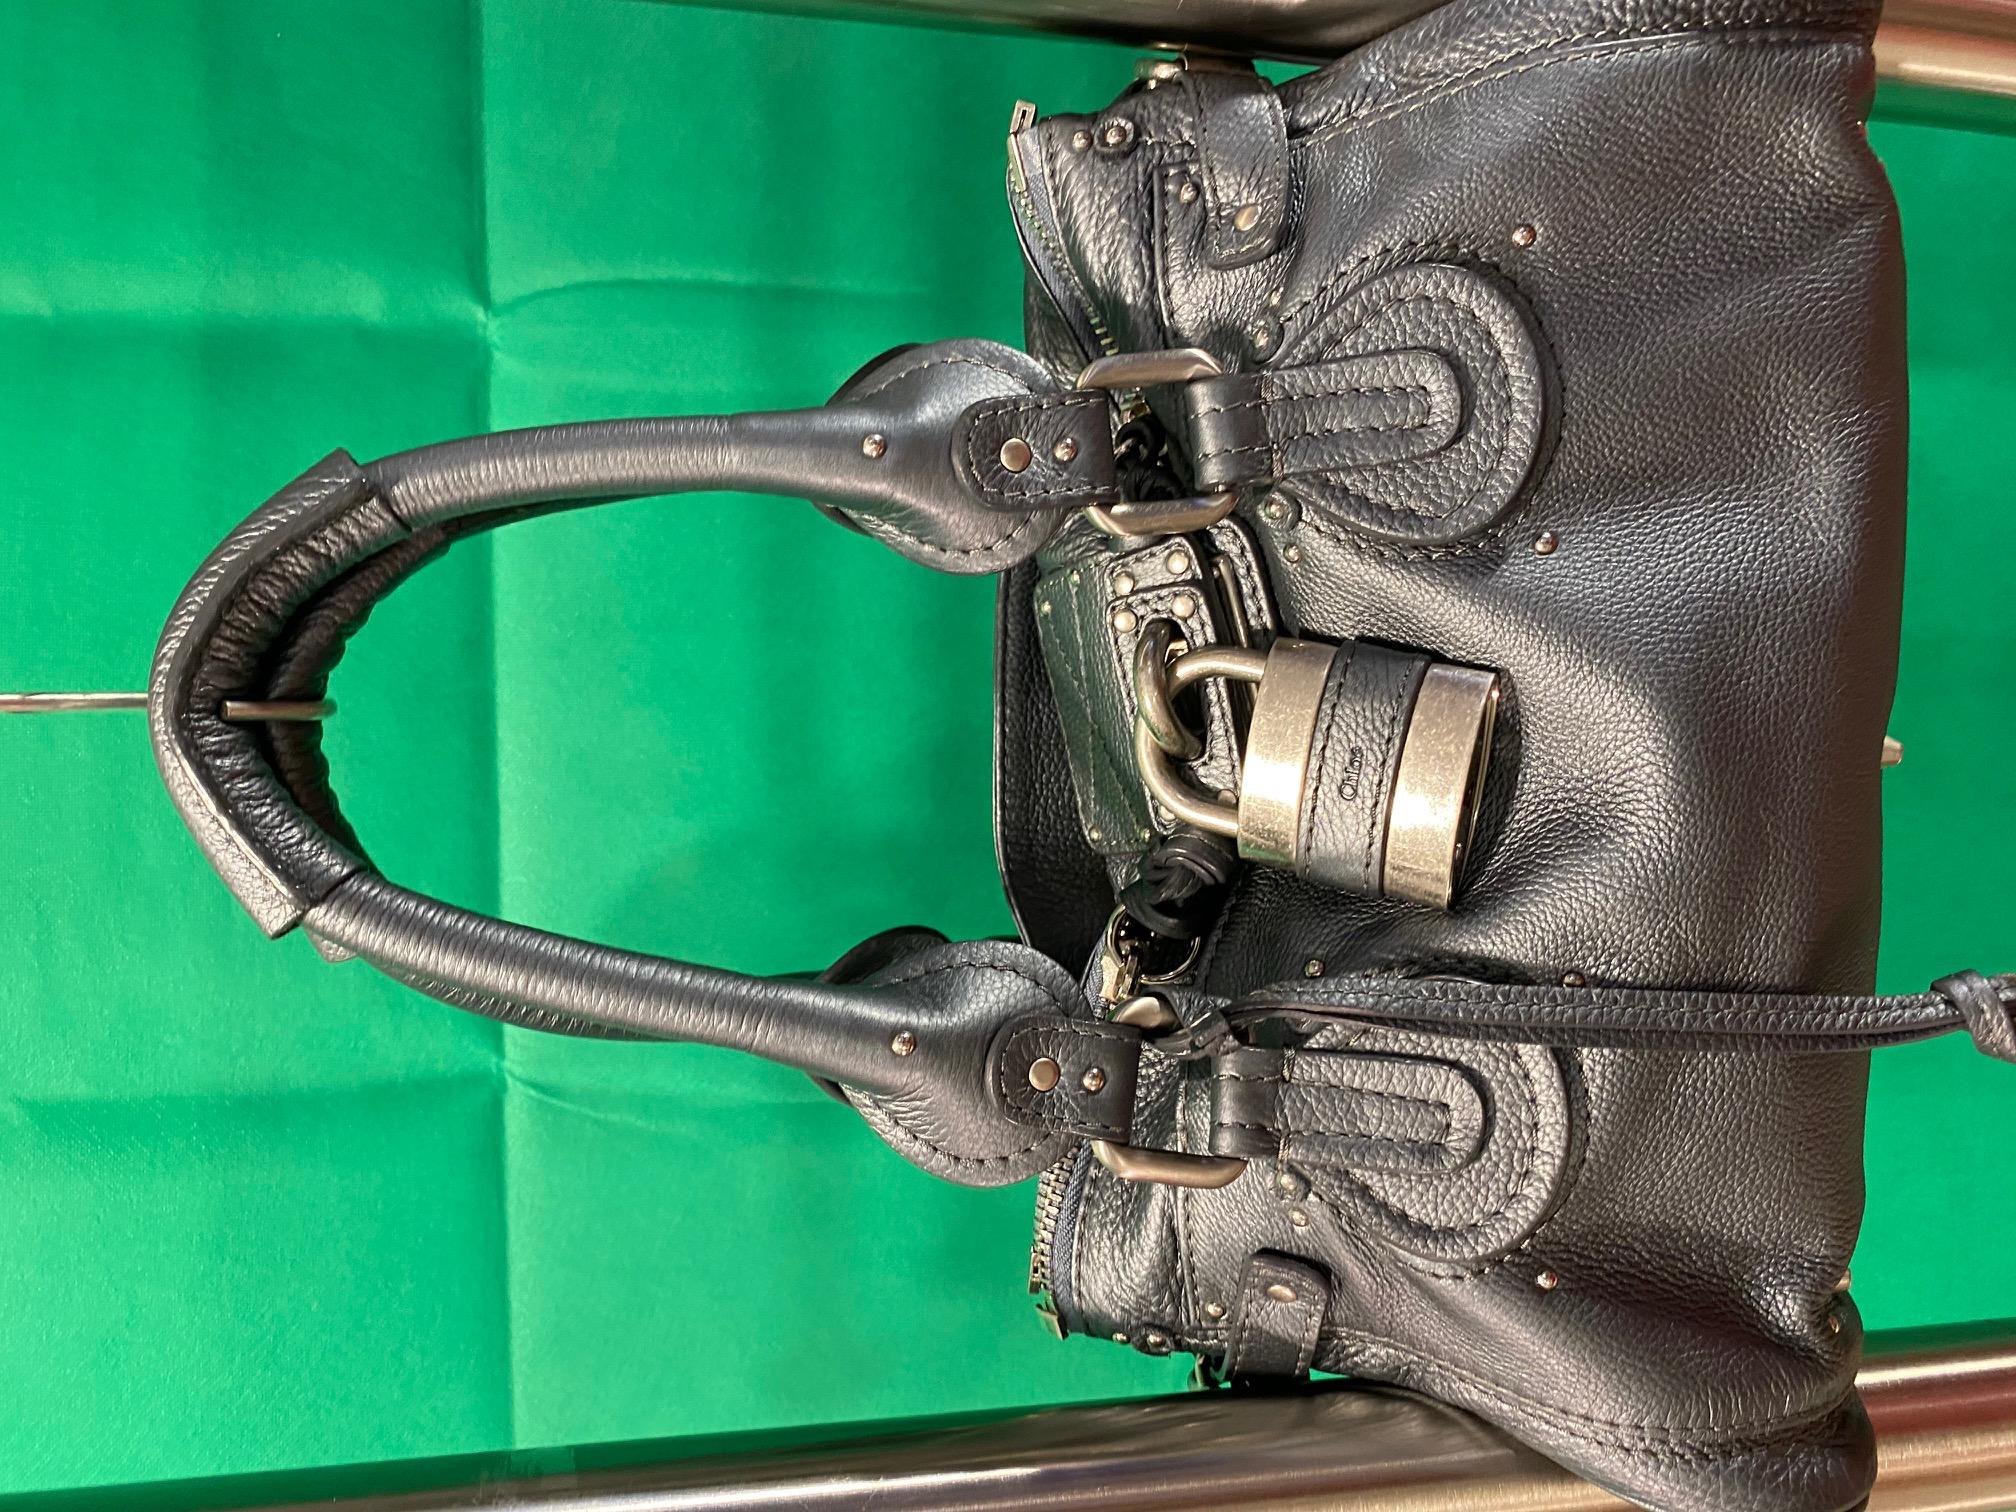 Tasche Leder metallic grau Chloe NP 1200,-